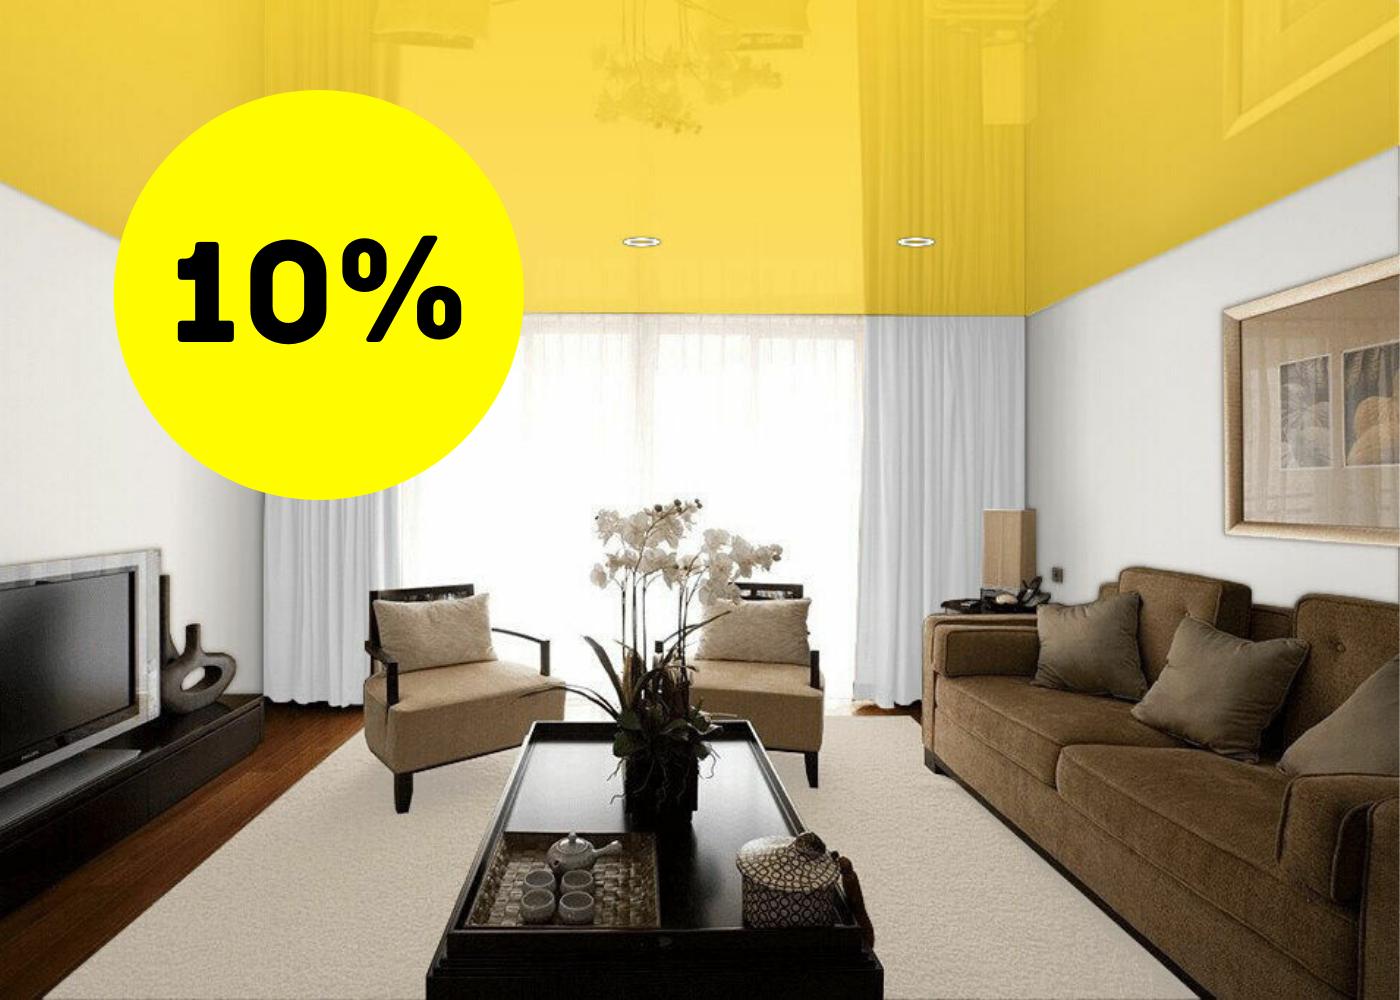 Скидка 10% при заказе потолков сразу  во всю квартиру